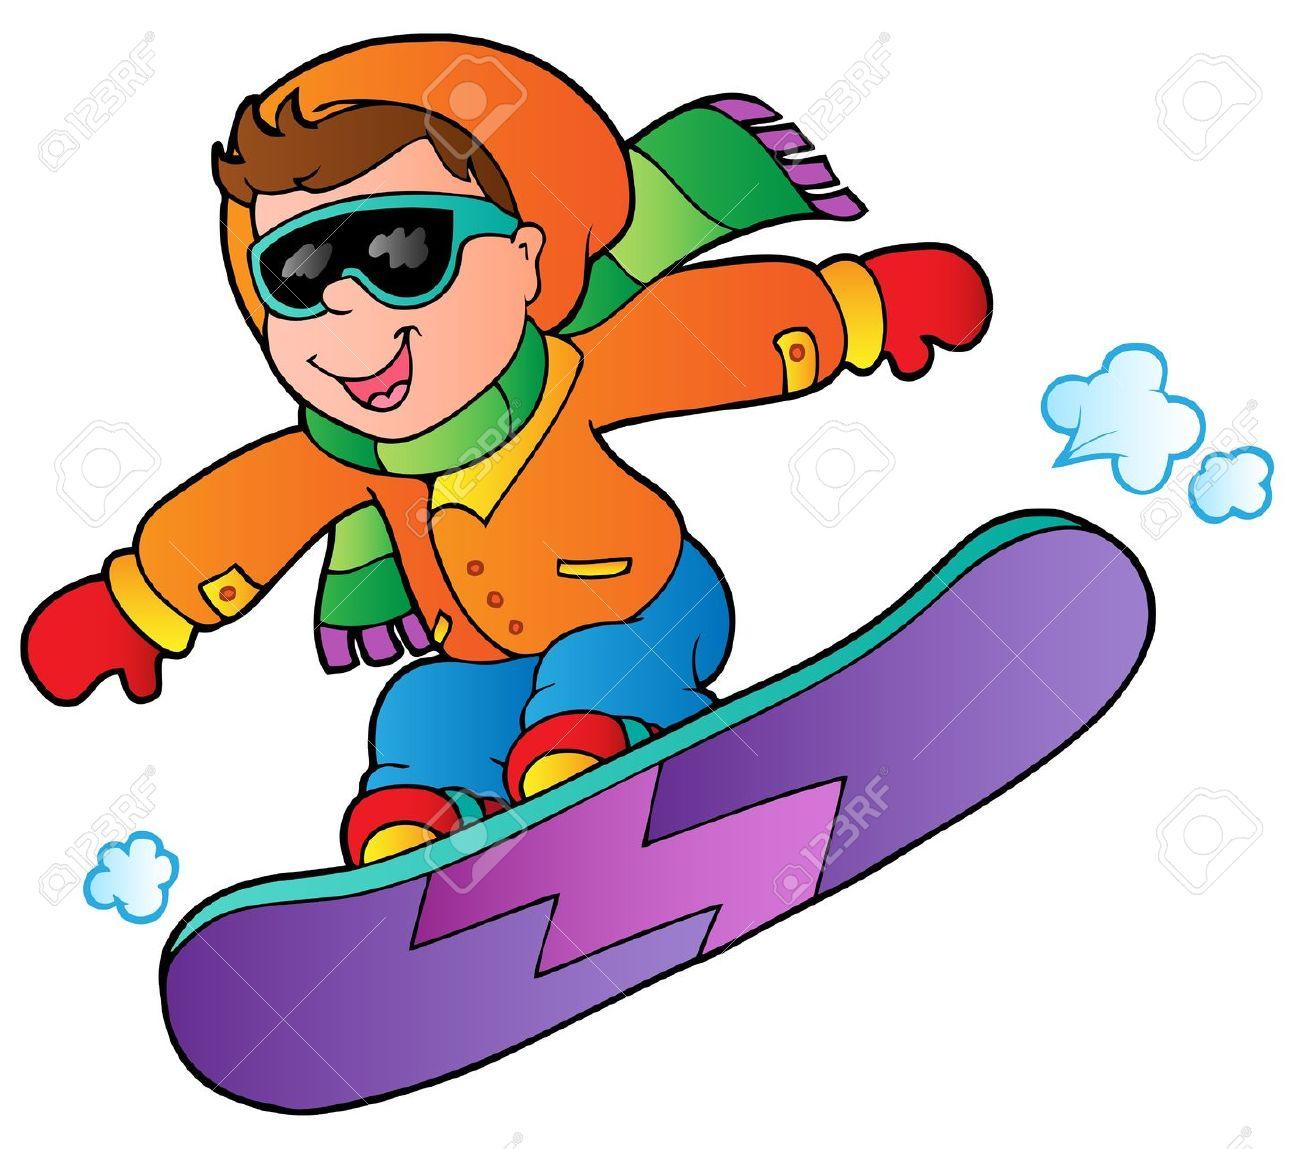 Clip Art Of Snowboarding-Clip art of snowboarding-1